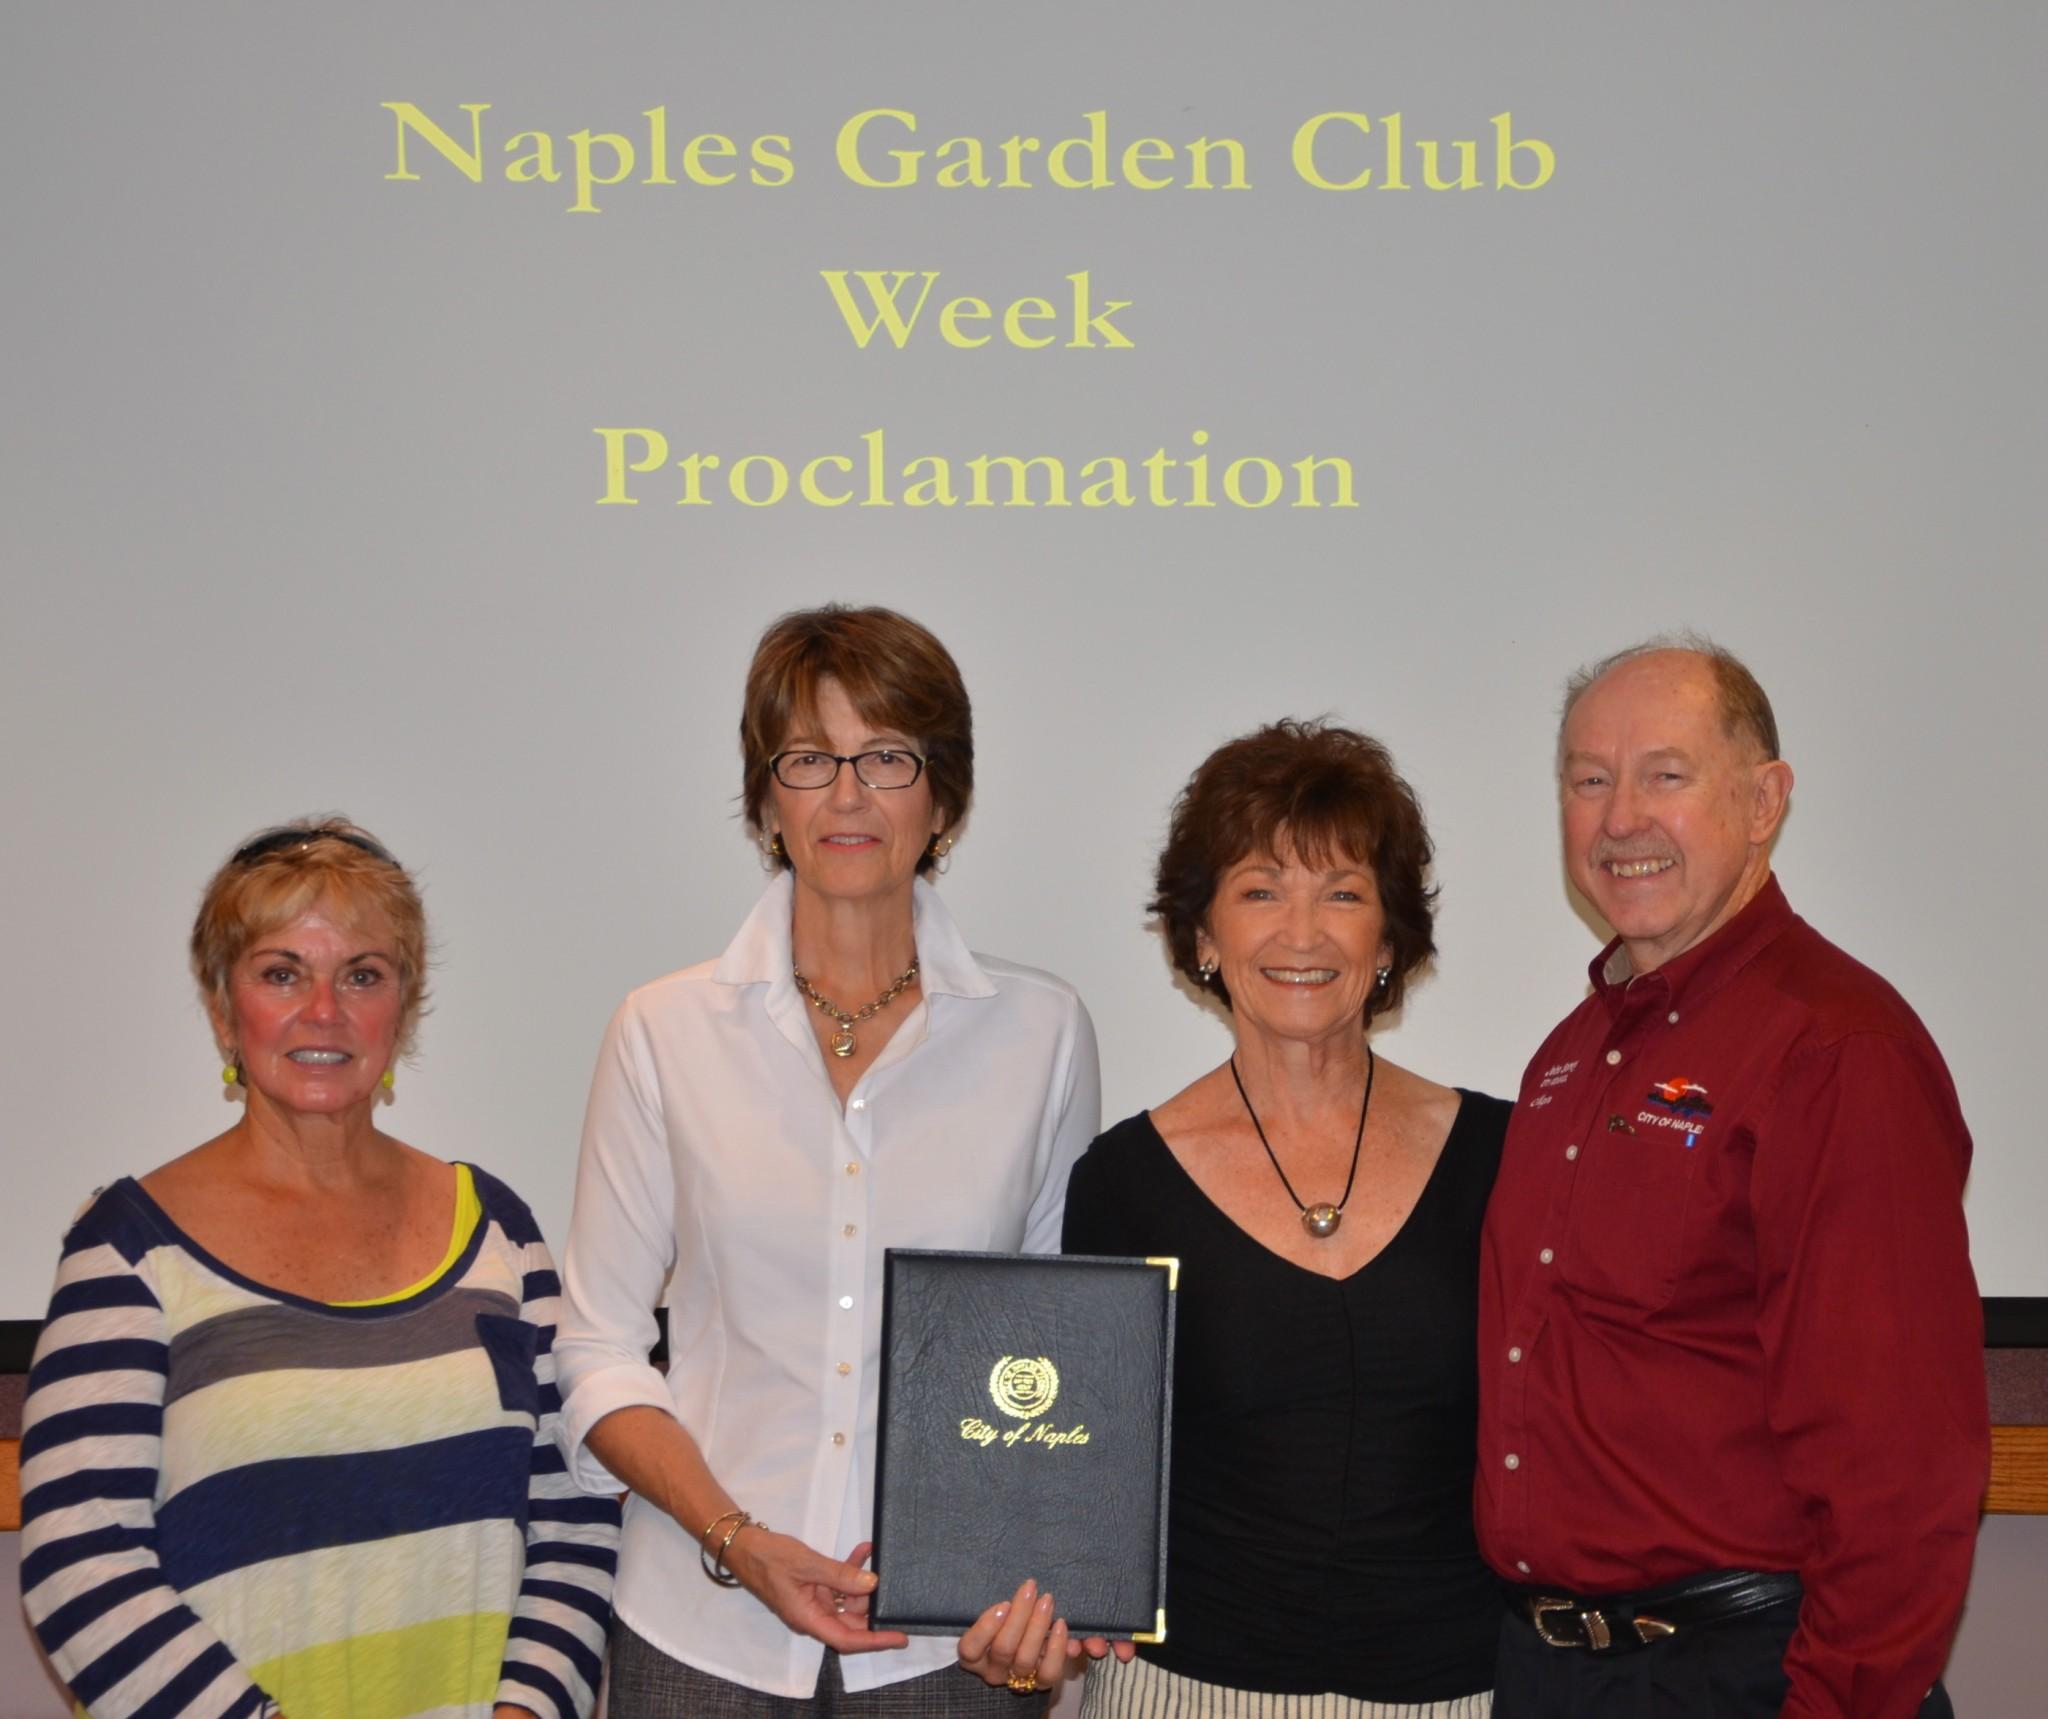 NGC week proclamation